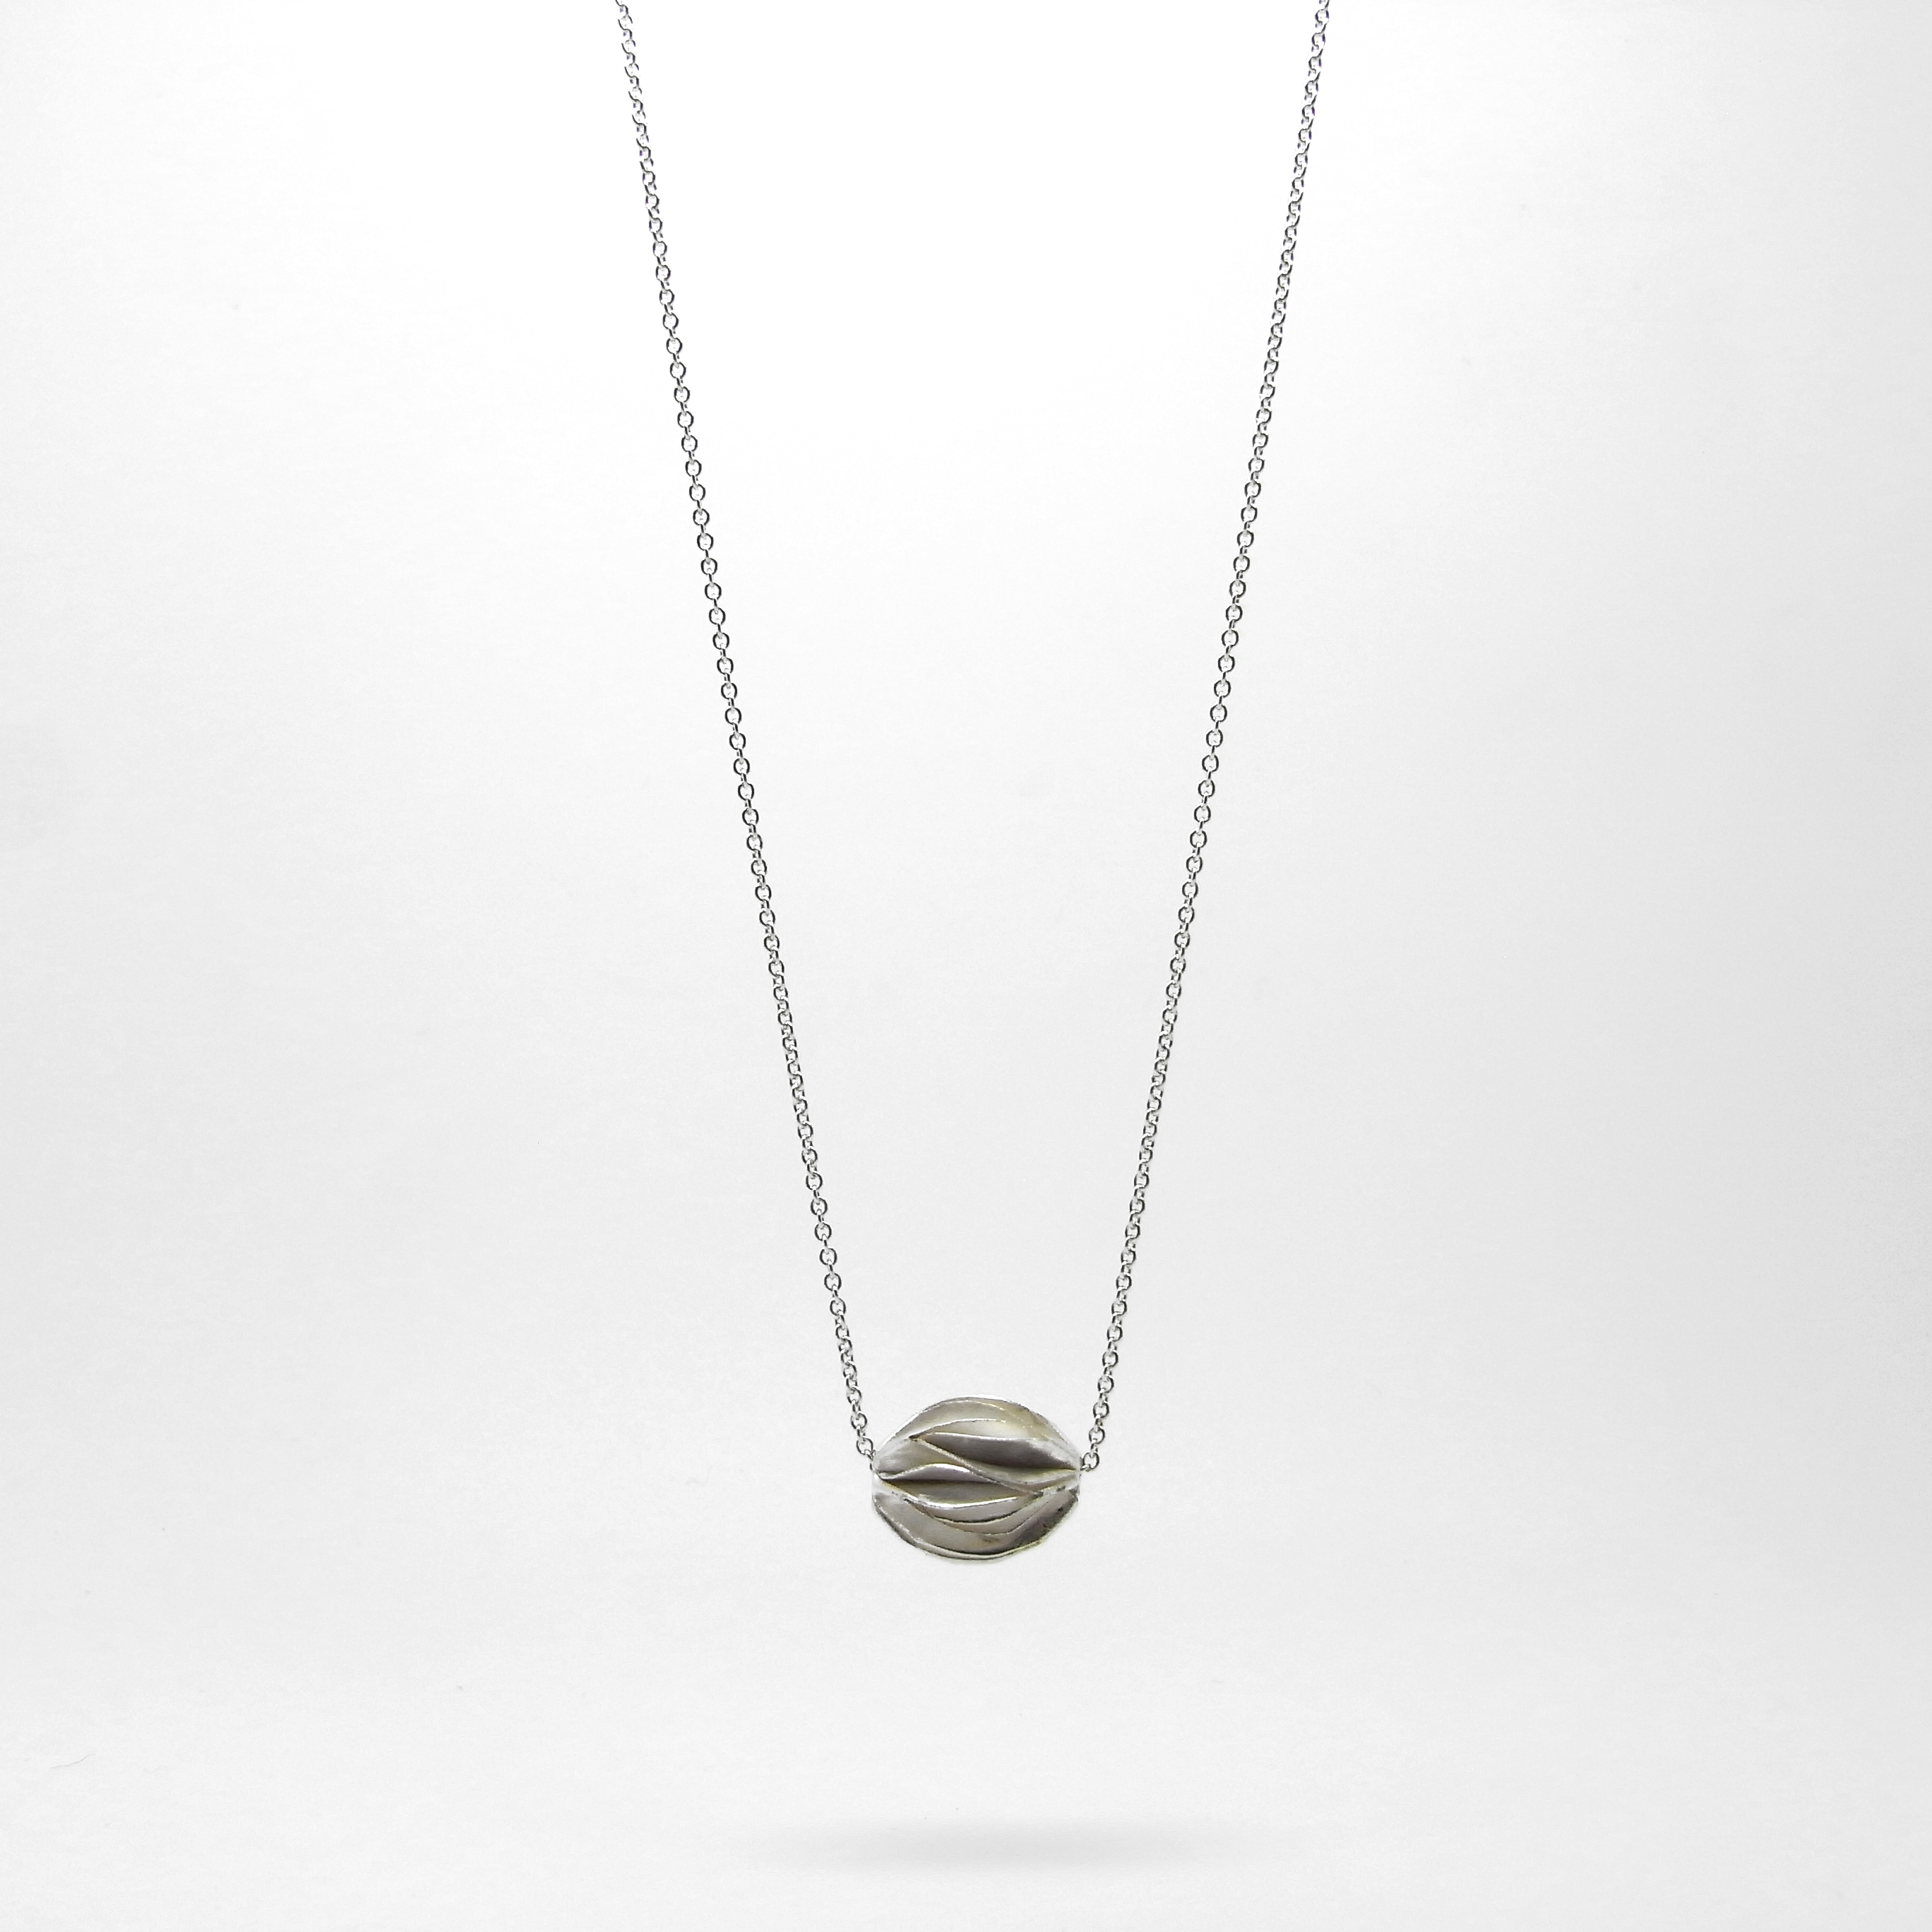 SALE - Sea Charm Necklace